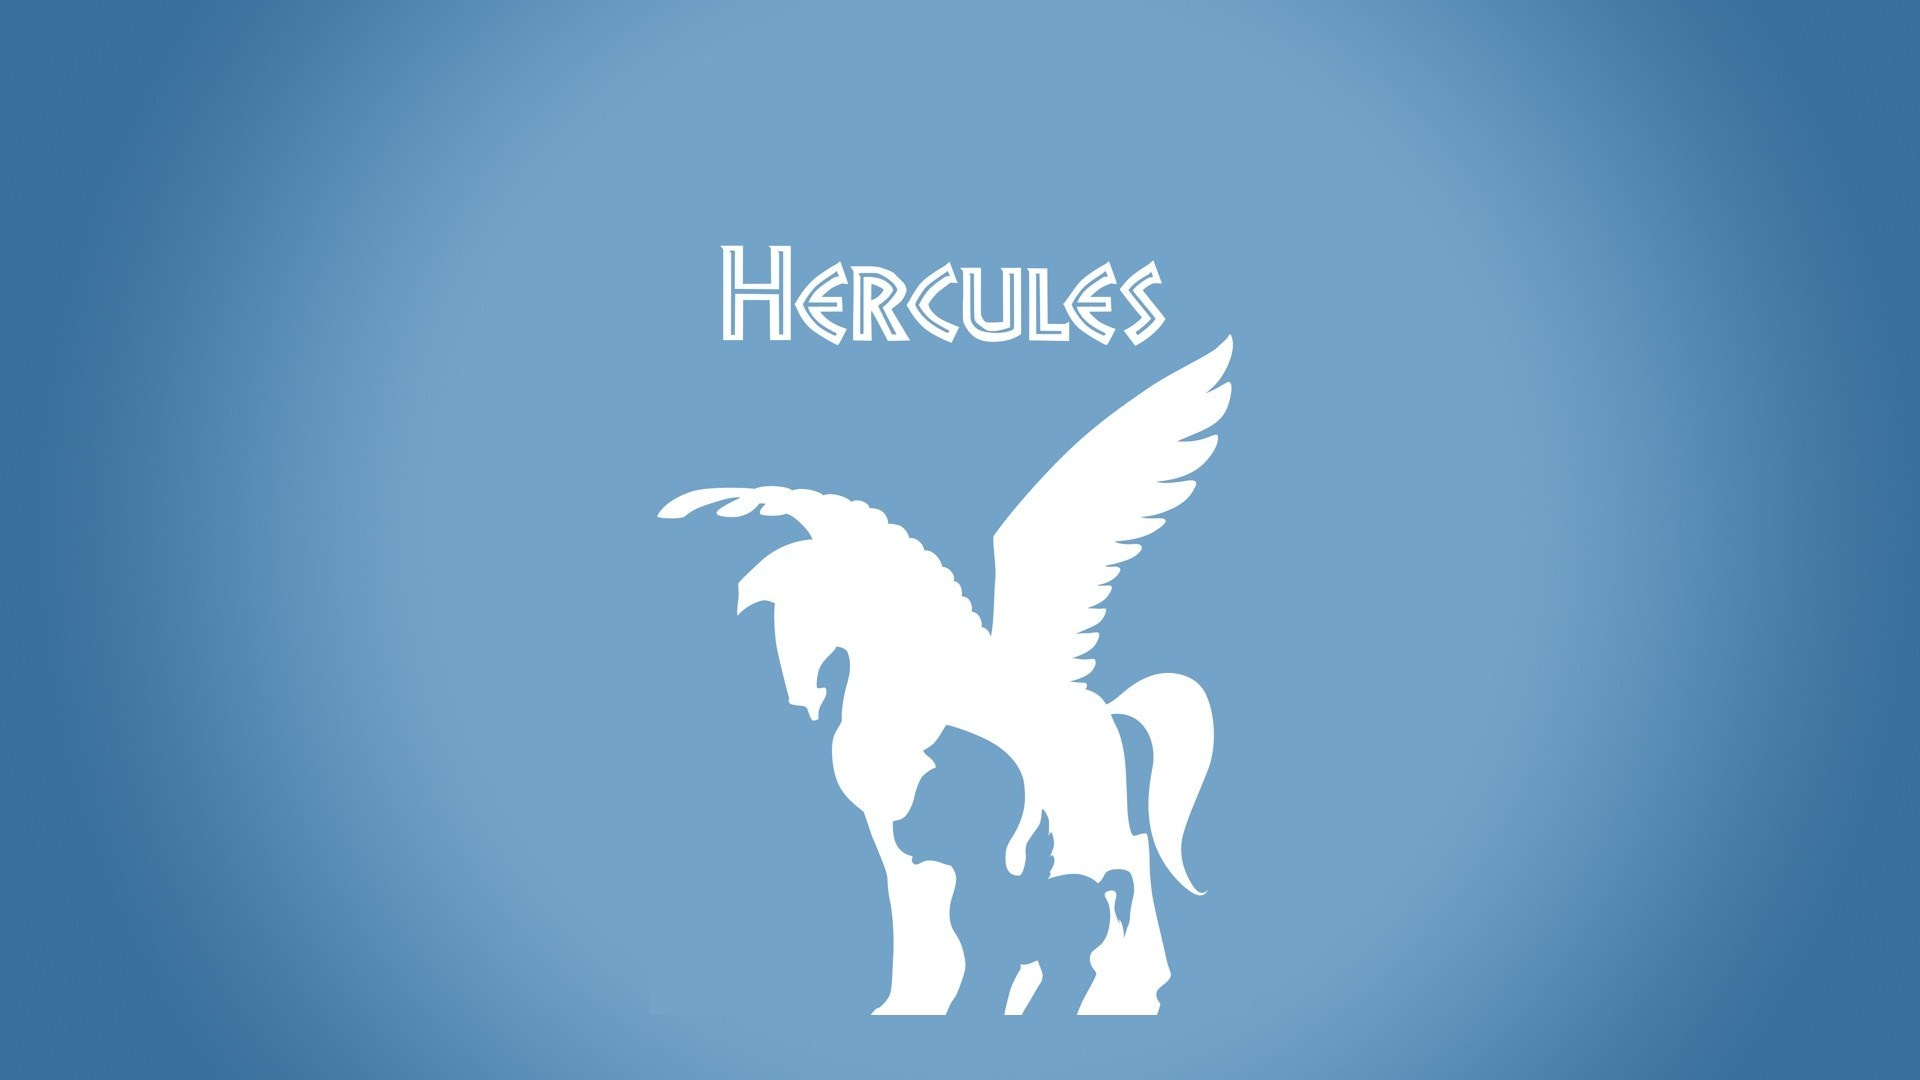 Hercules Disney 1920 x 1080 Download Close 1920x1080